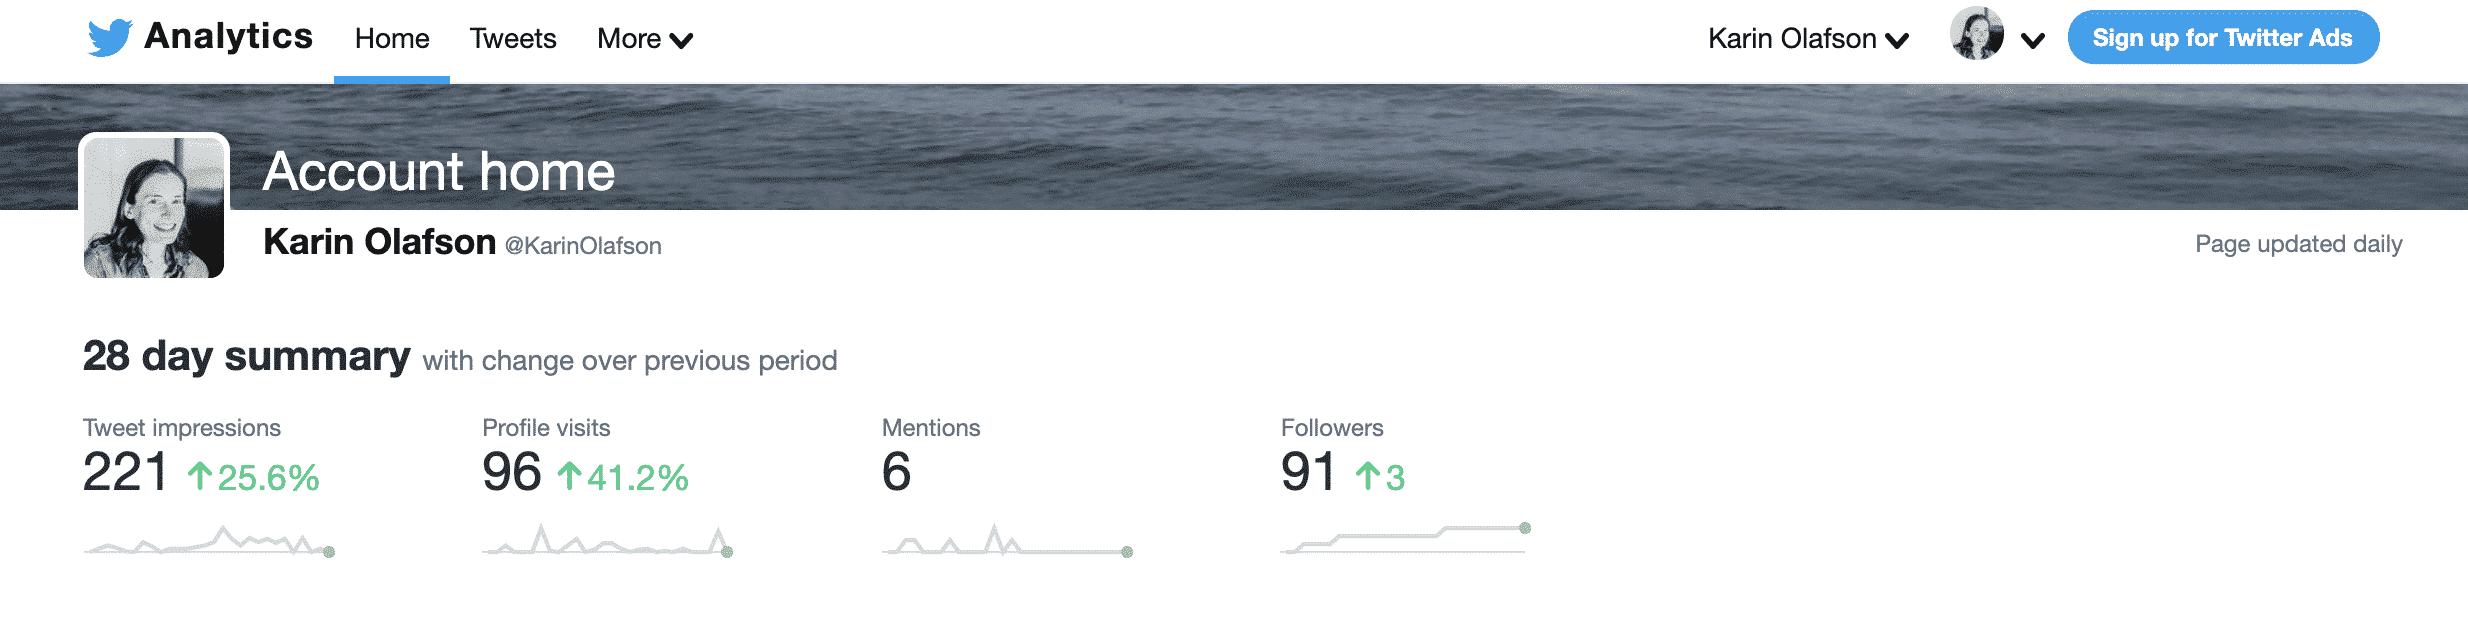 Twitter Analytics landing page